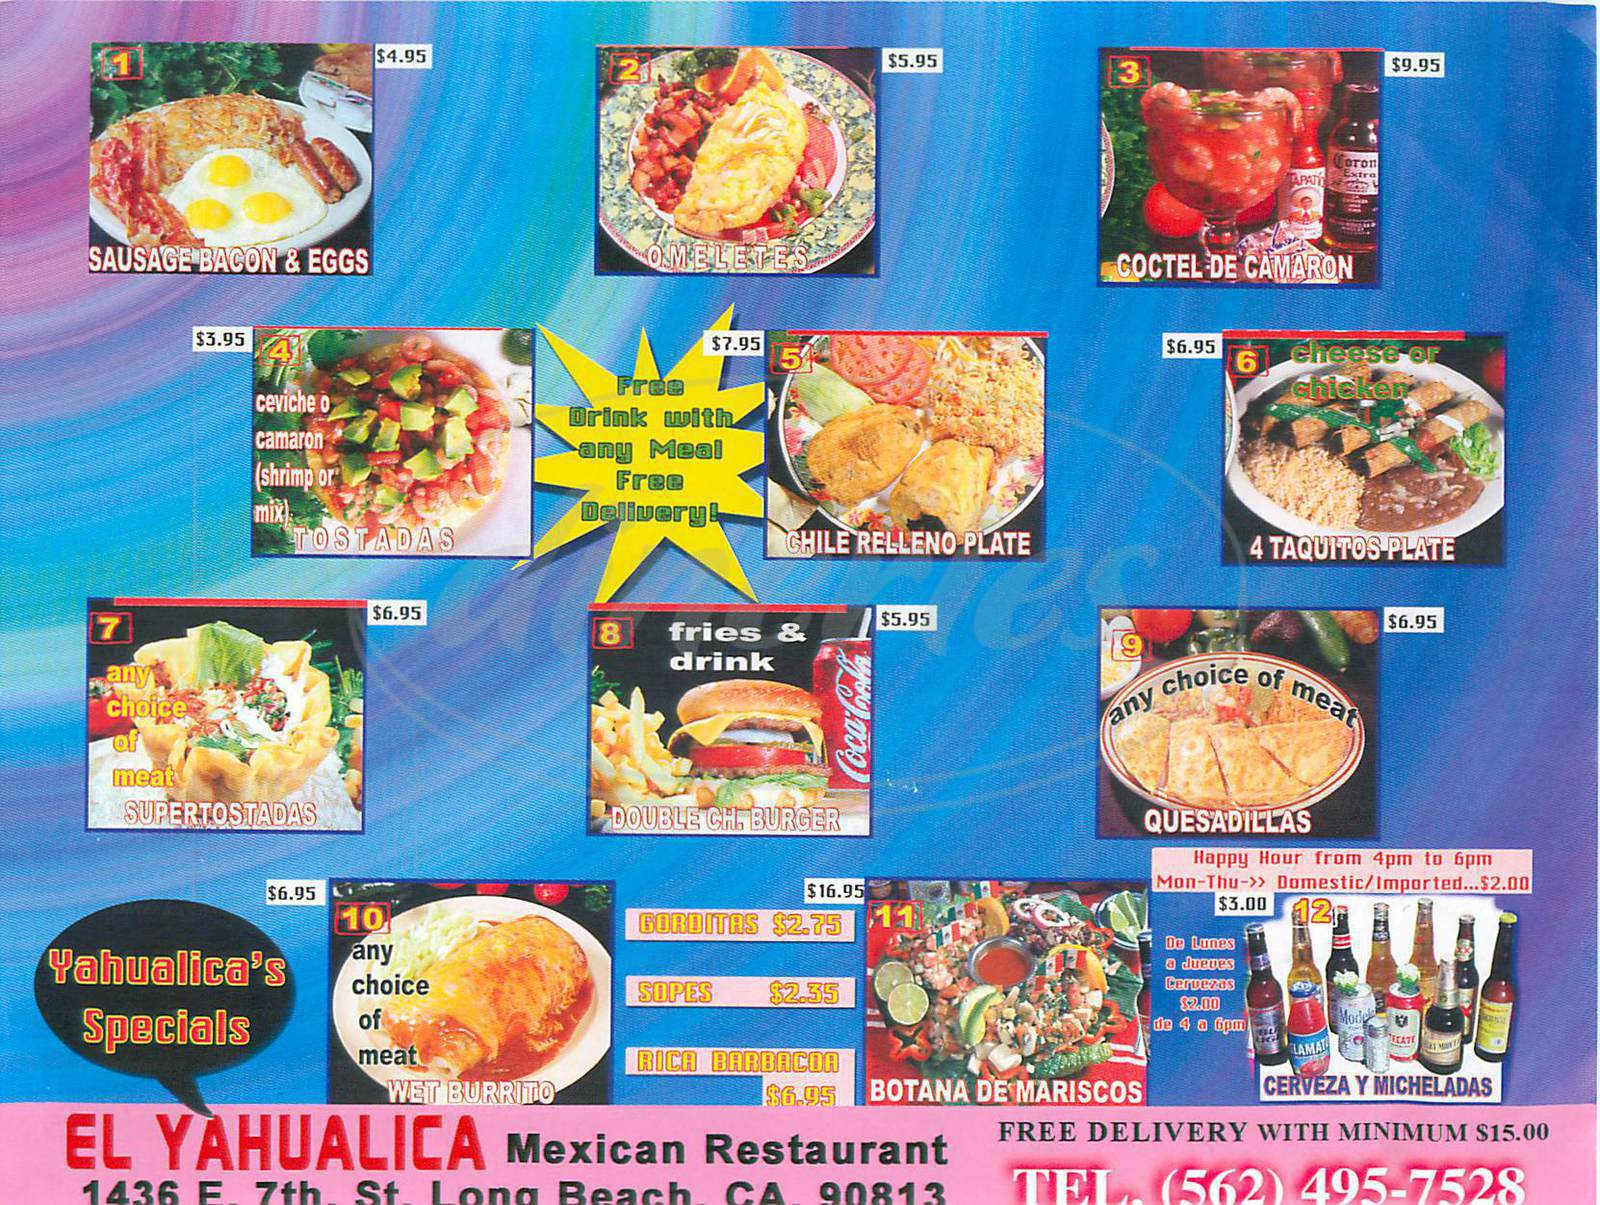 menu for El Yahualica